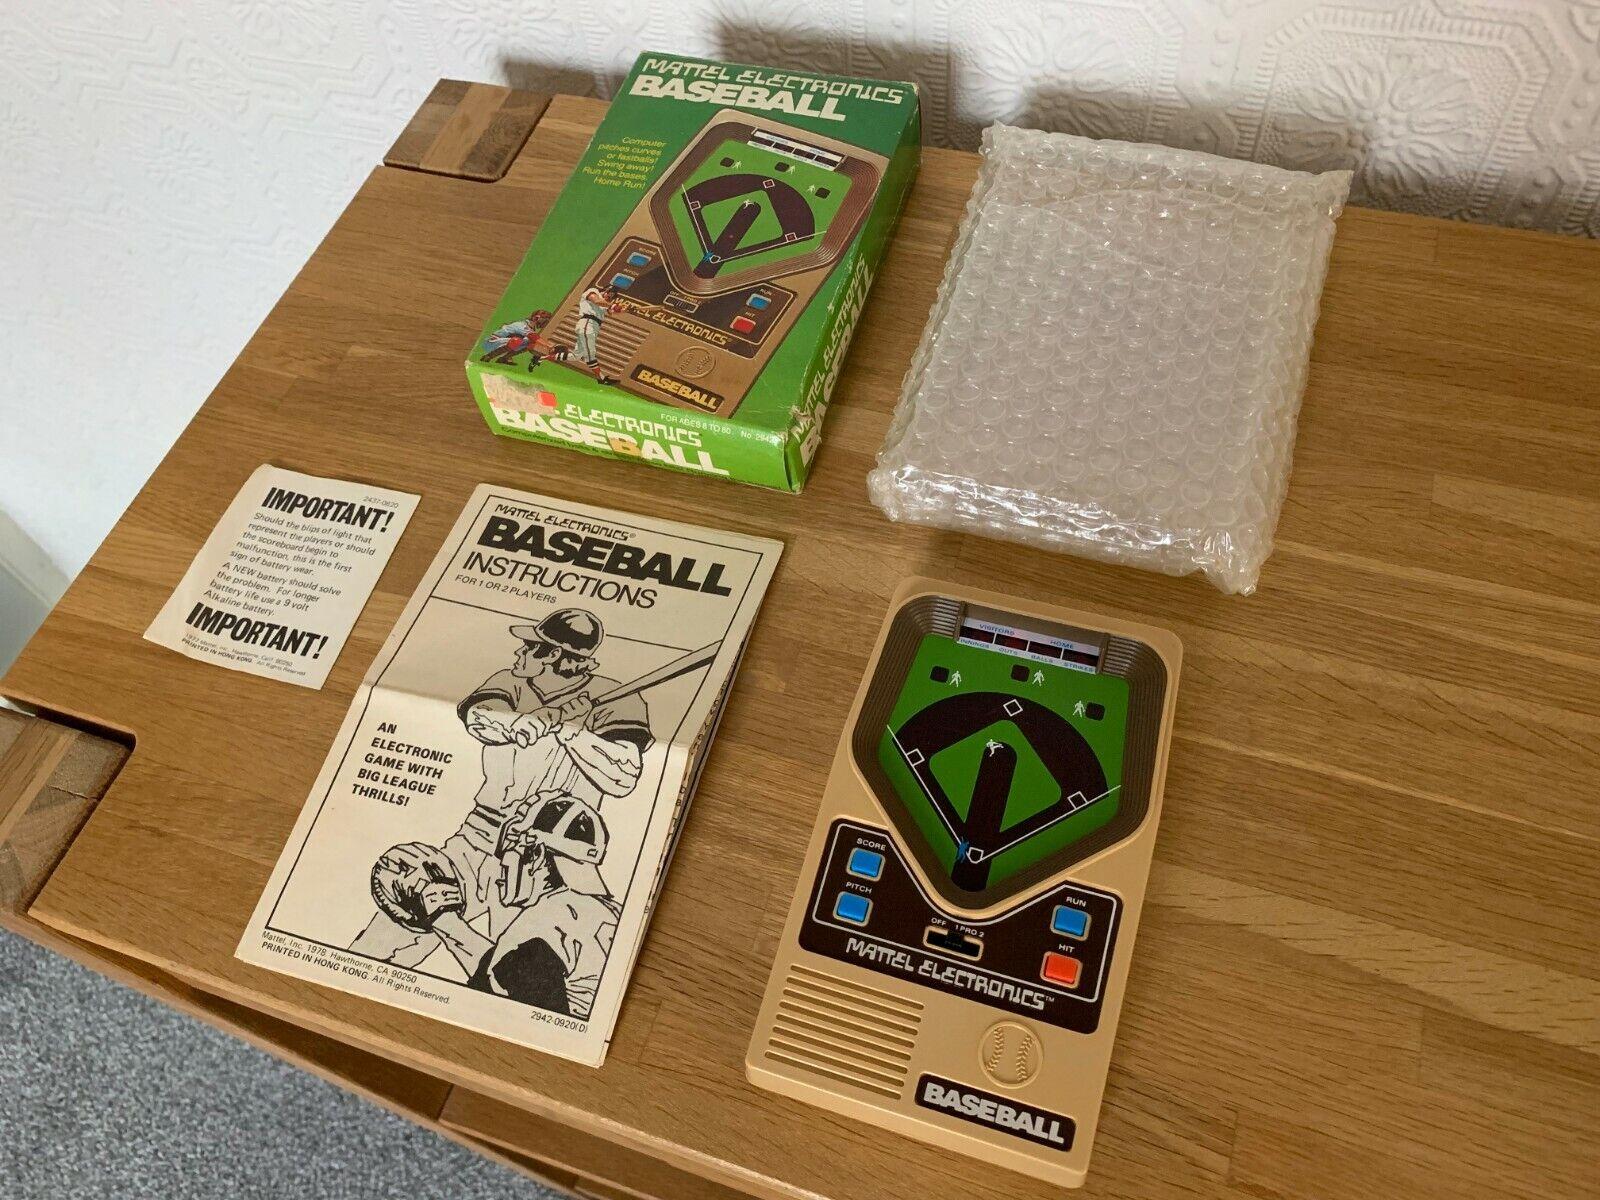 Very Rare Boxed Mattel Electronics Baseball Vintage 1978 1978 LED Handheld Game Mint